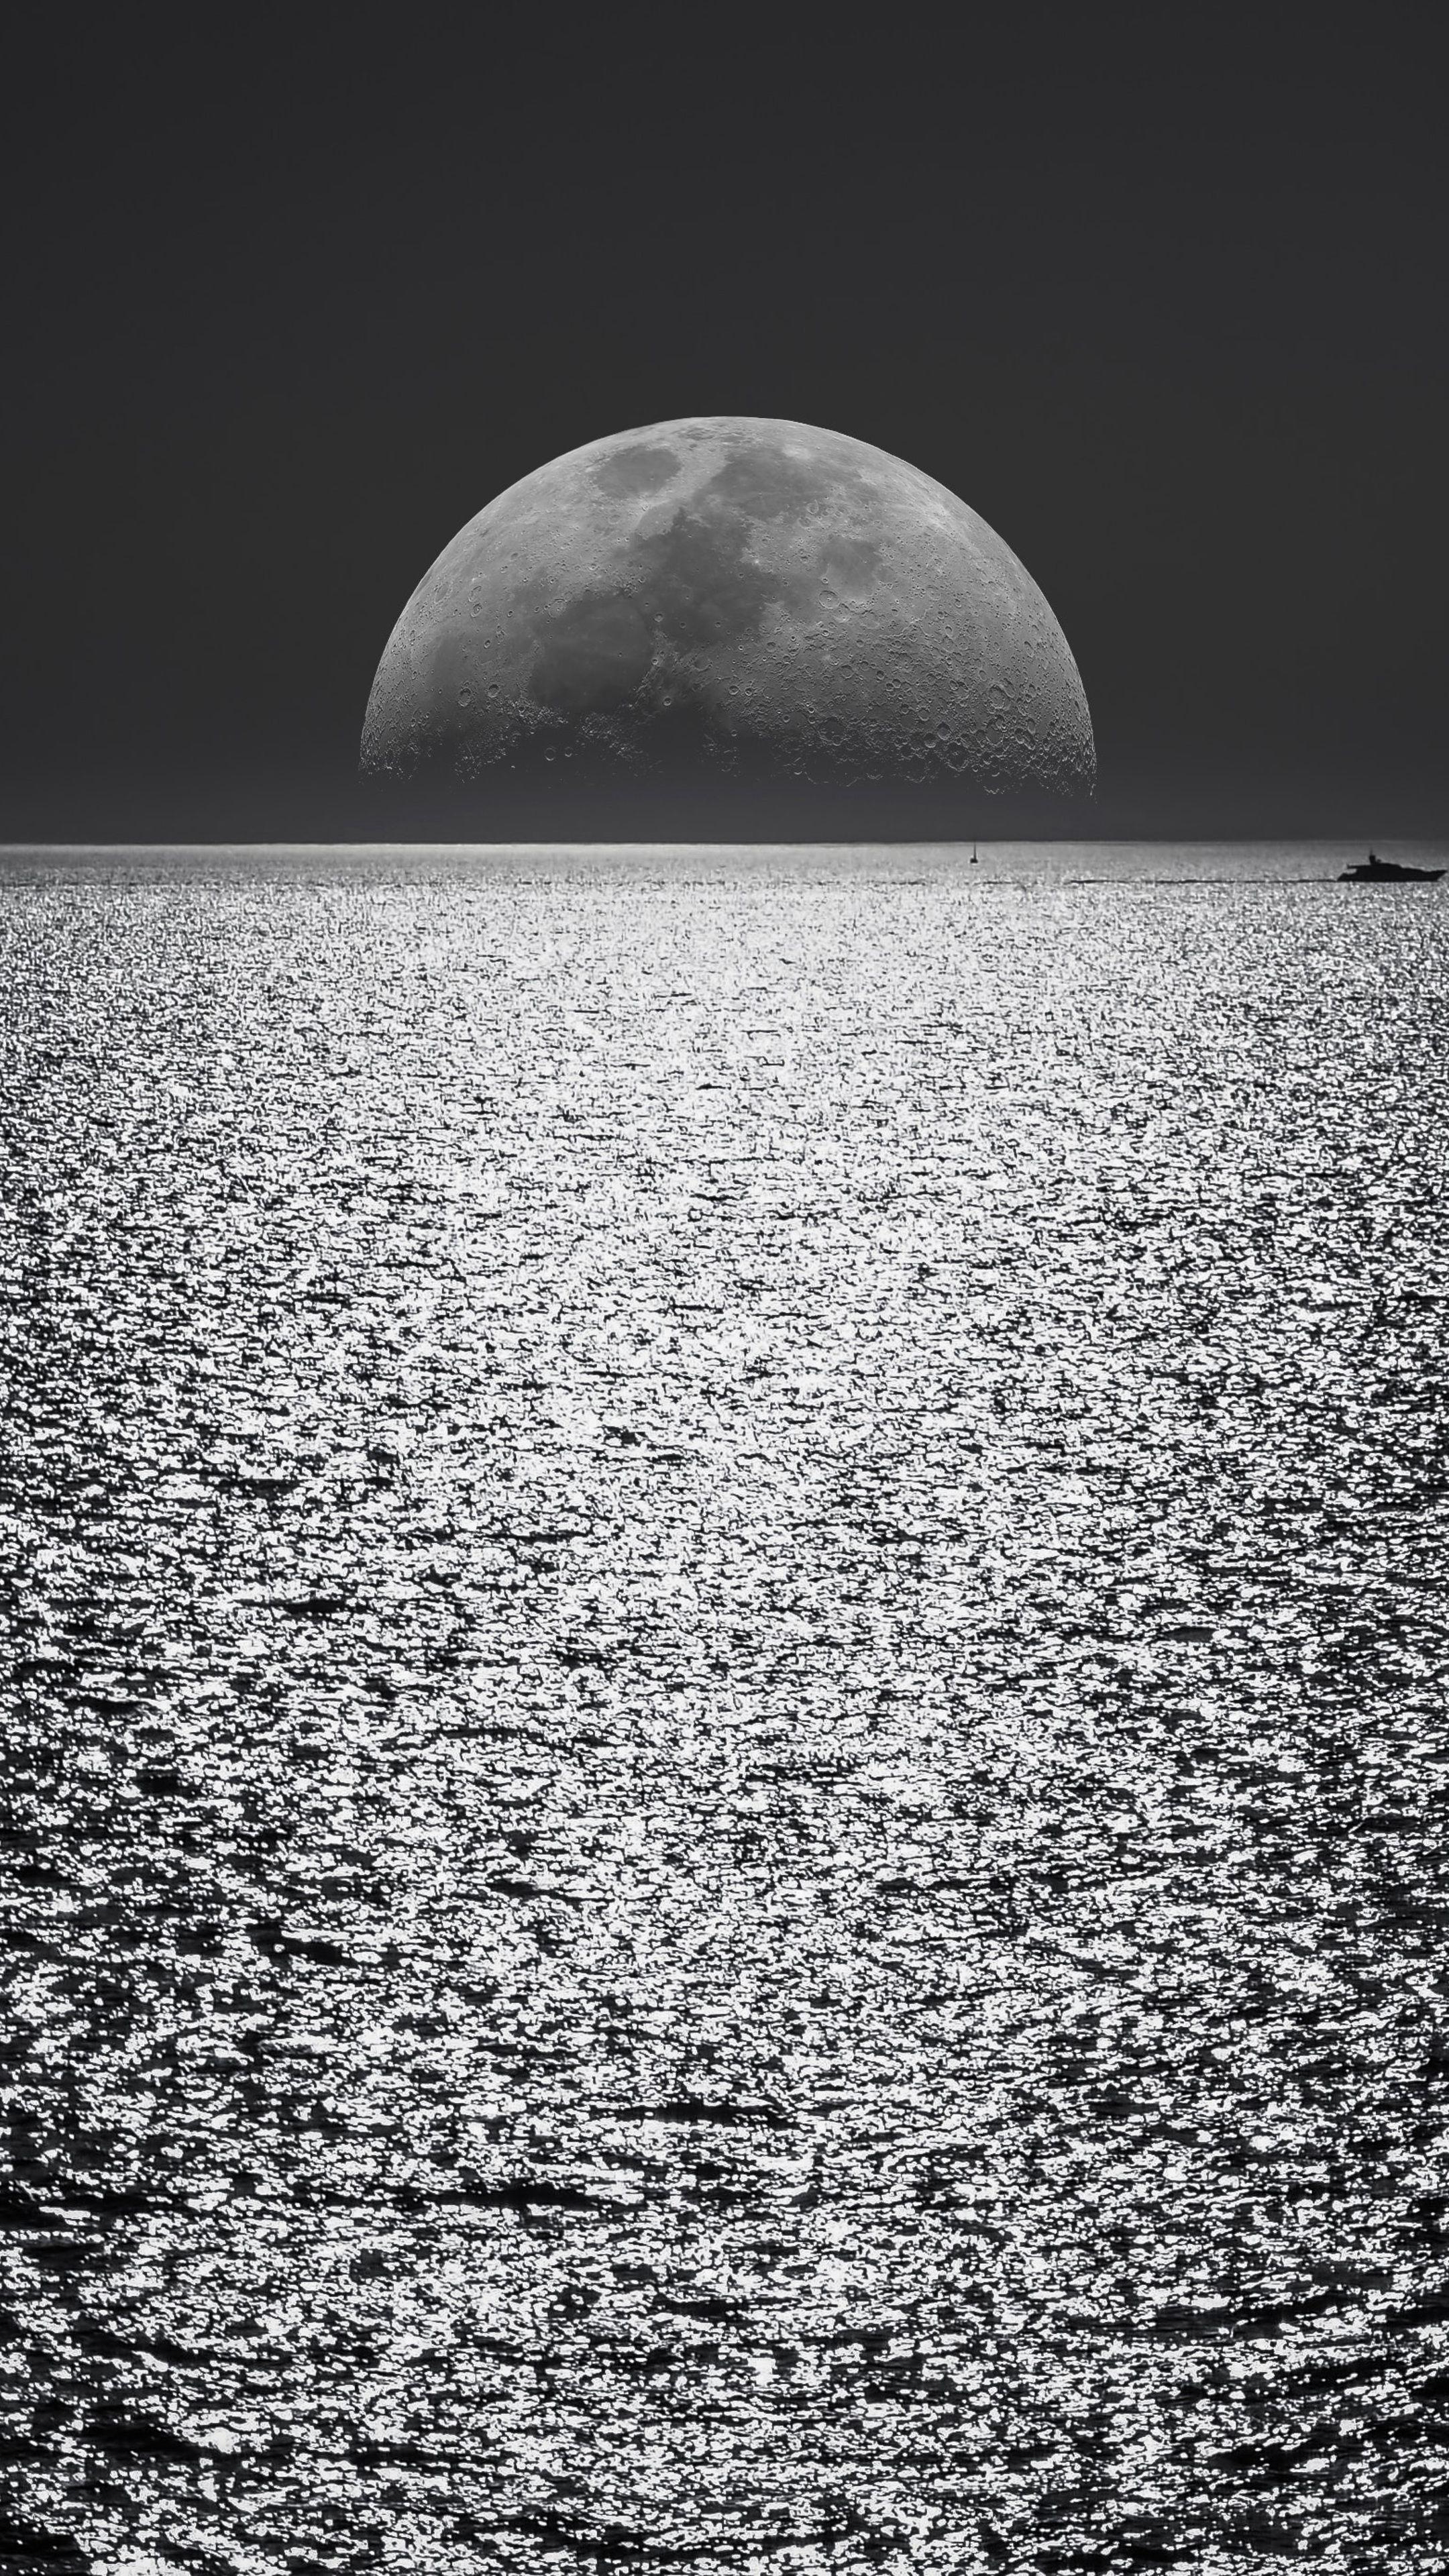 Nature White Black Moon Evening Night Time Seascape 5k Wallpapers Wallpaper Monochrome 1080p Wallpaper